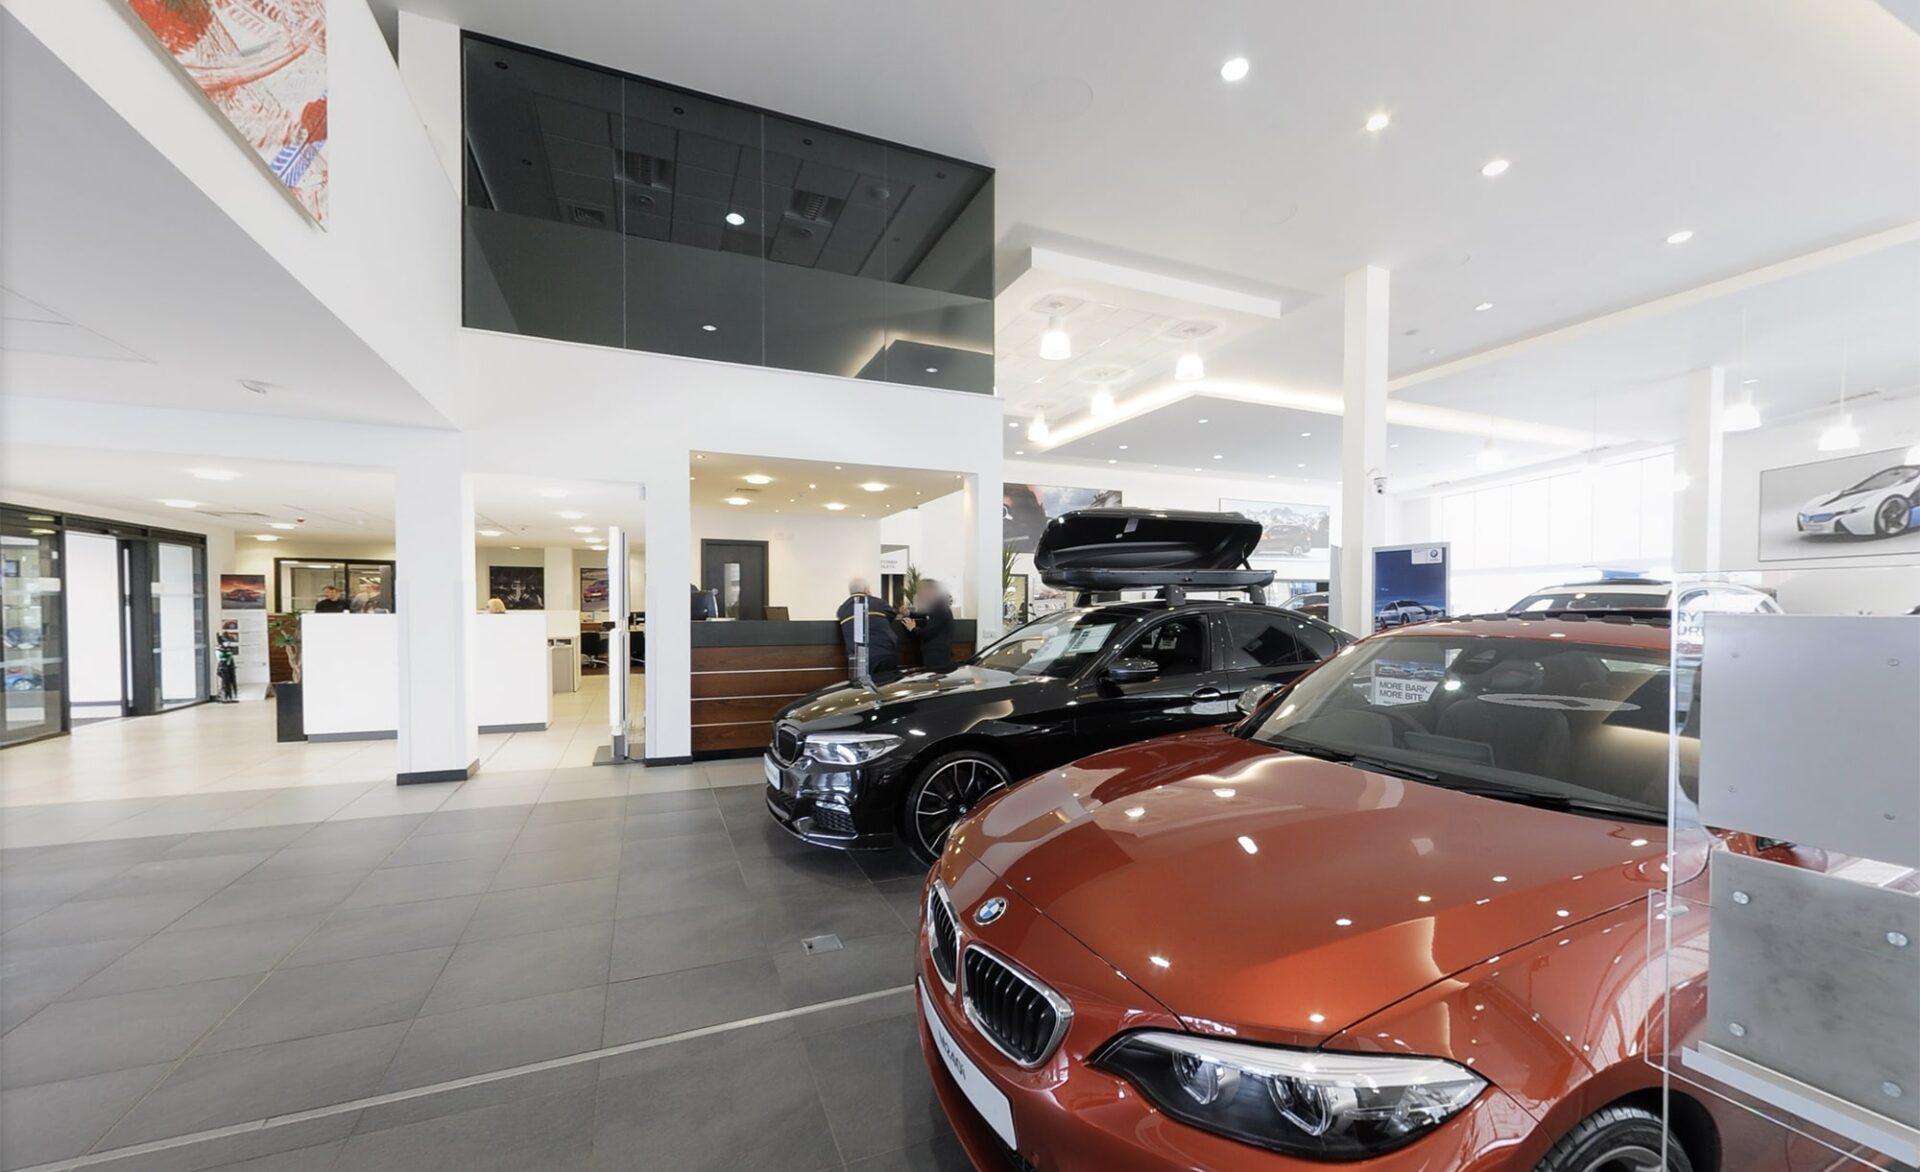 Rybrook Wolverhampton BMW Google Maps Business View Photography